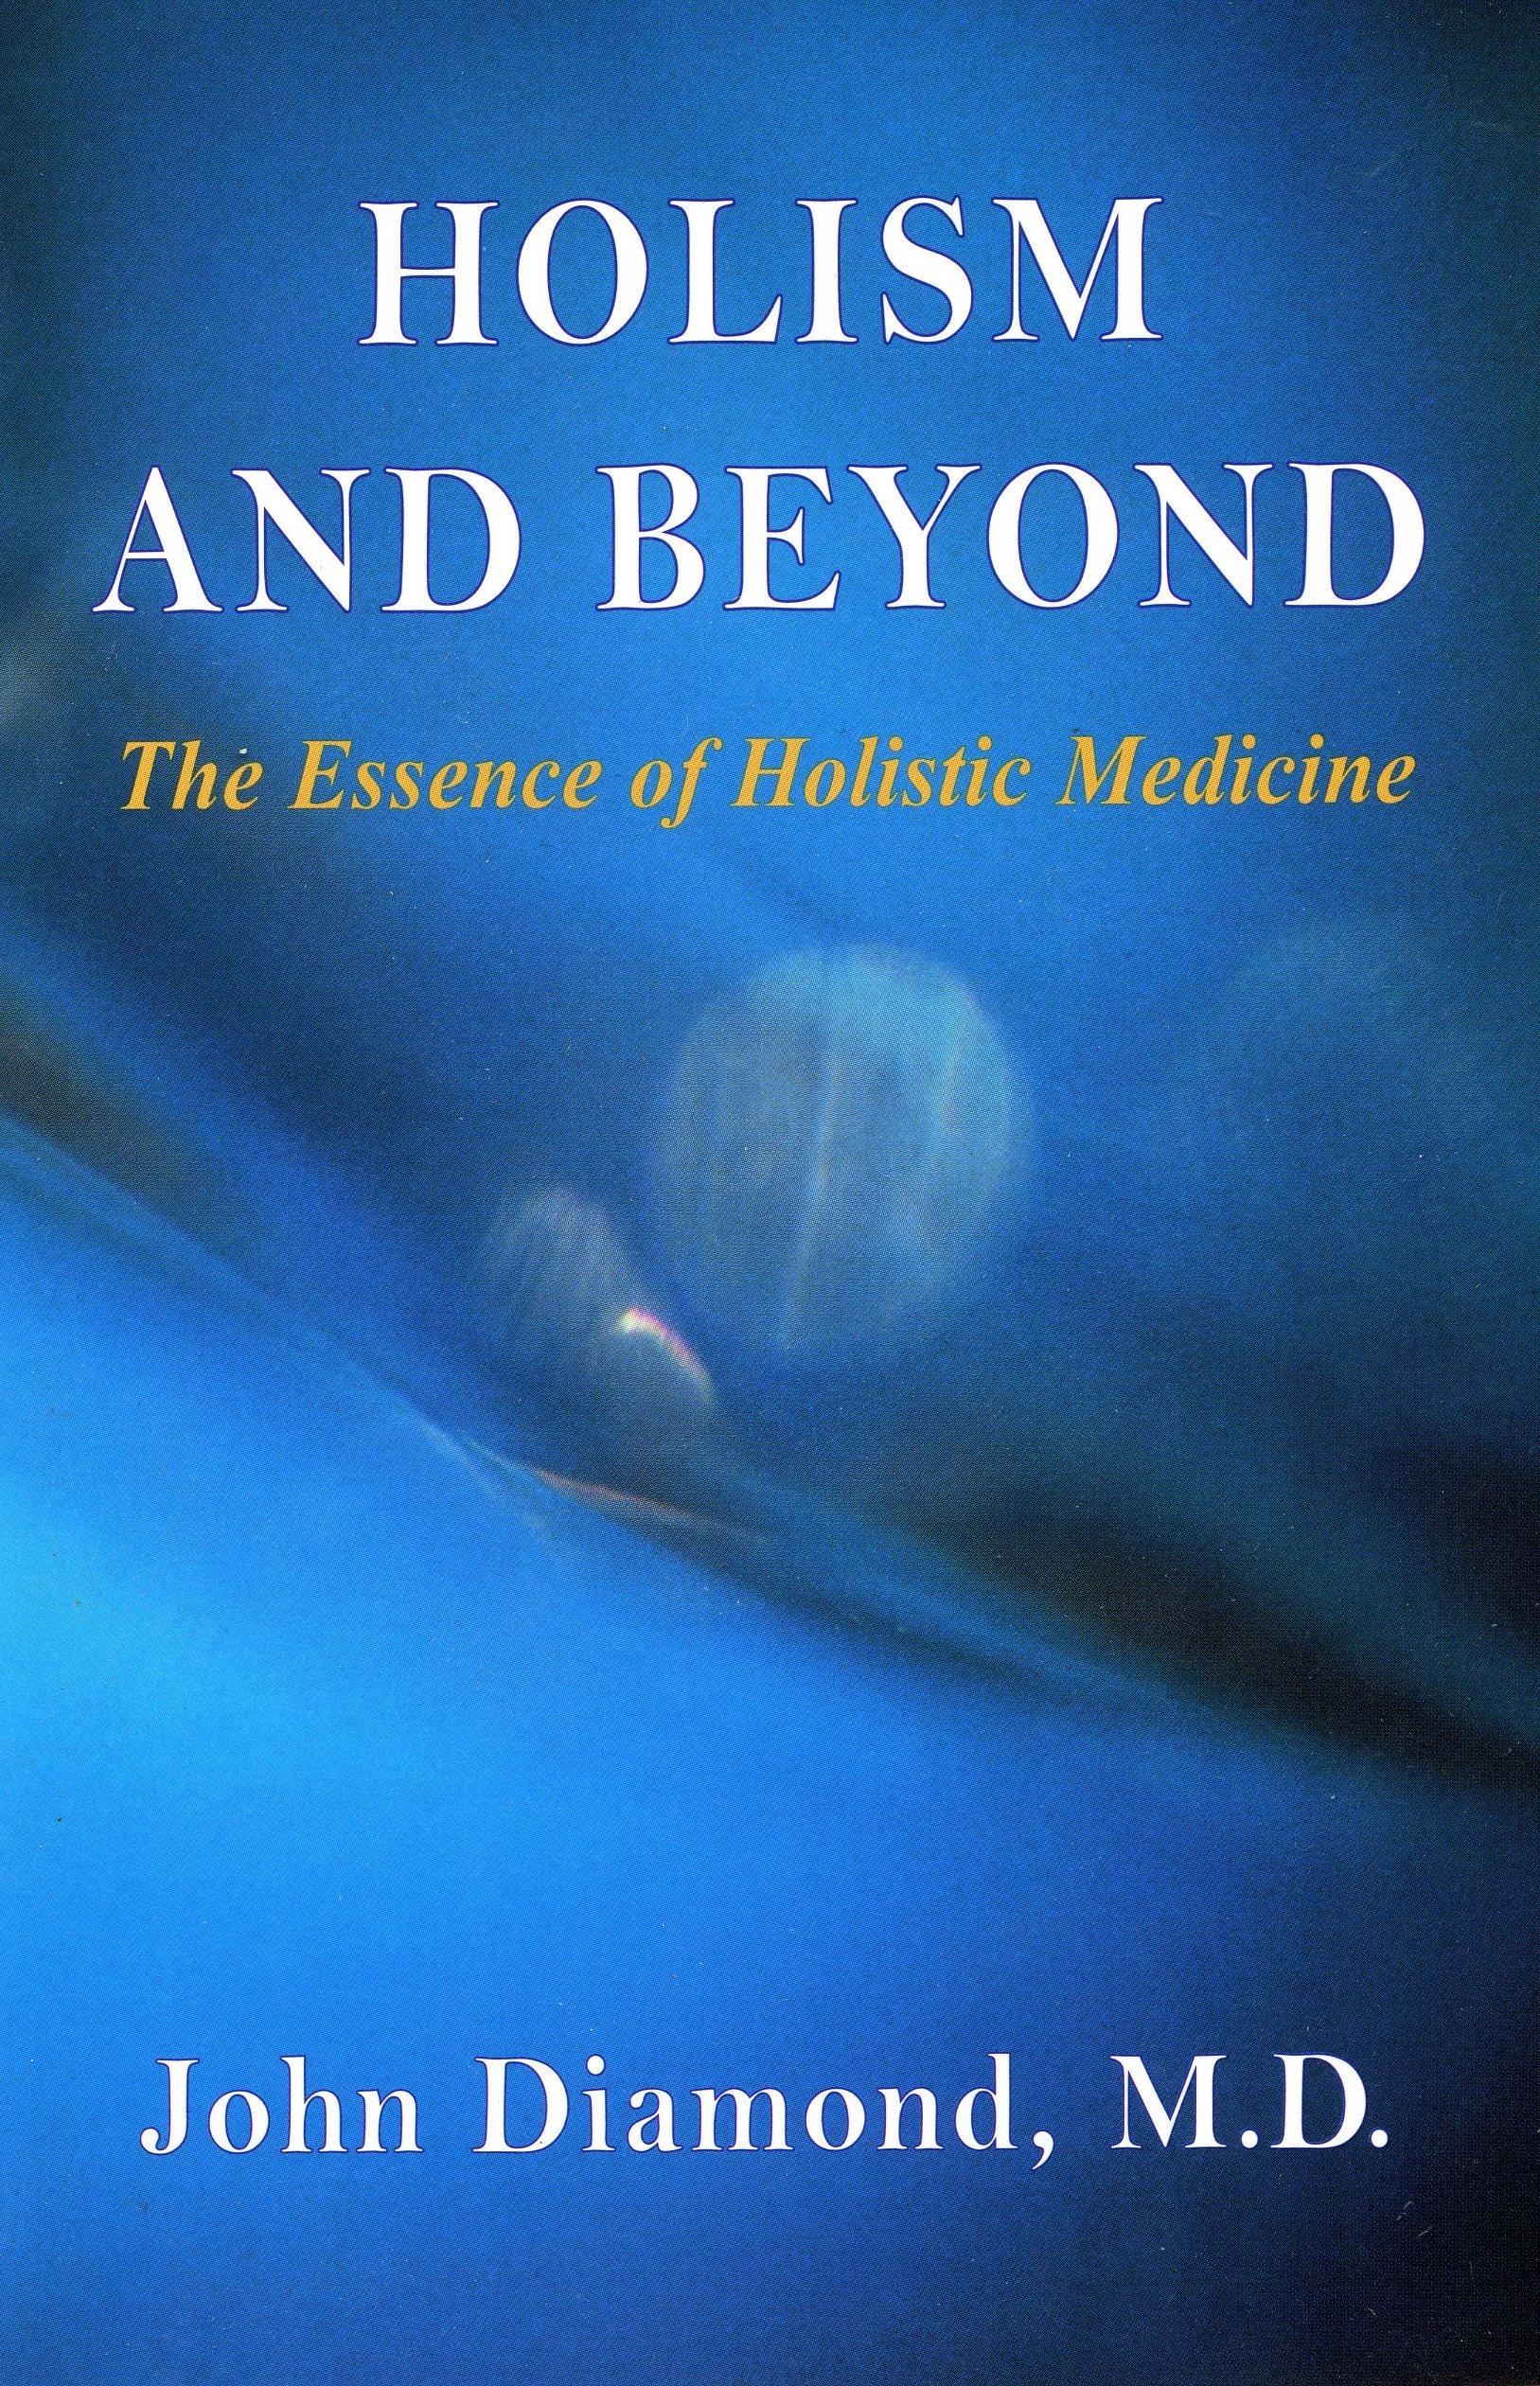 Holism and Beyond: The Essence of Holistic Healing